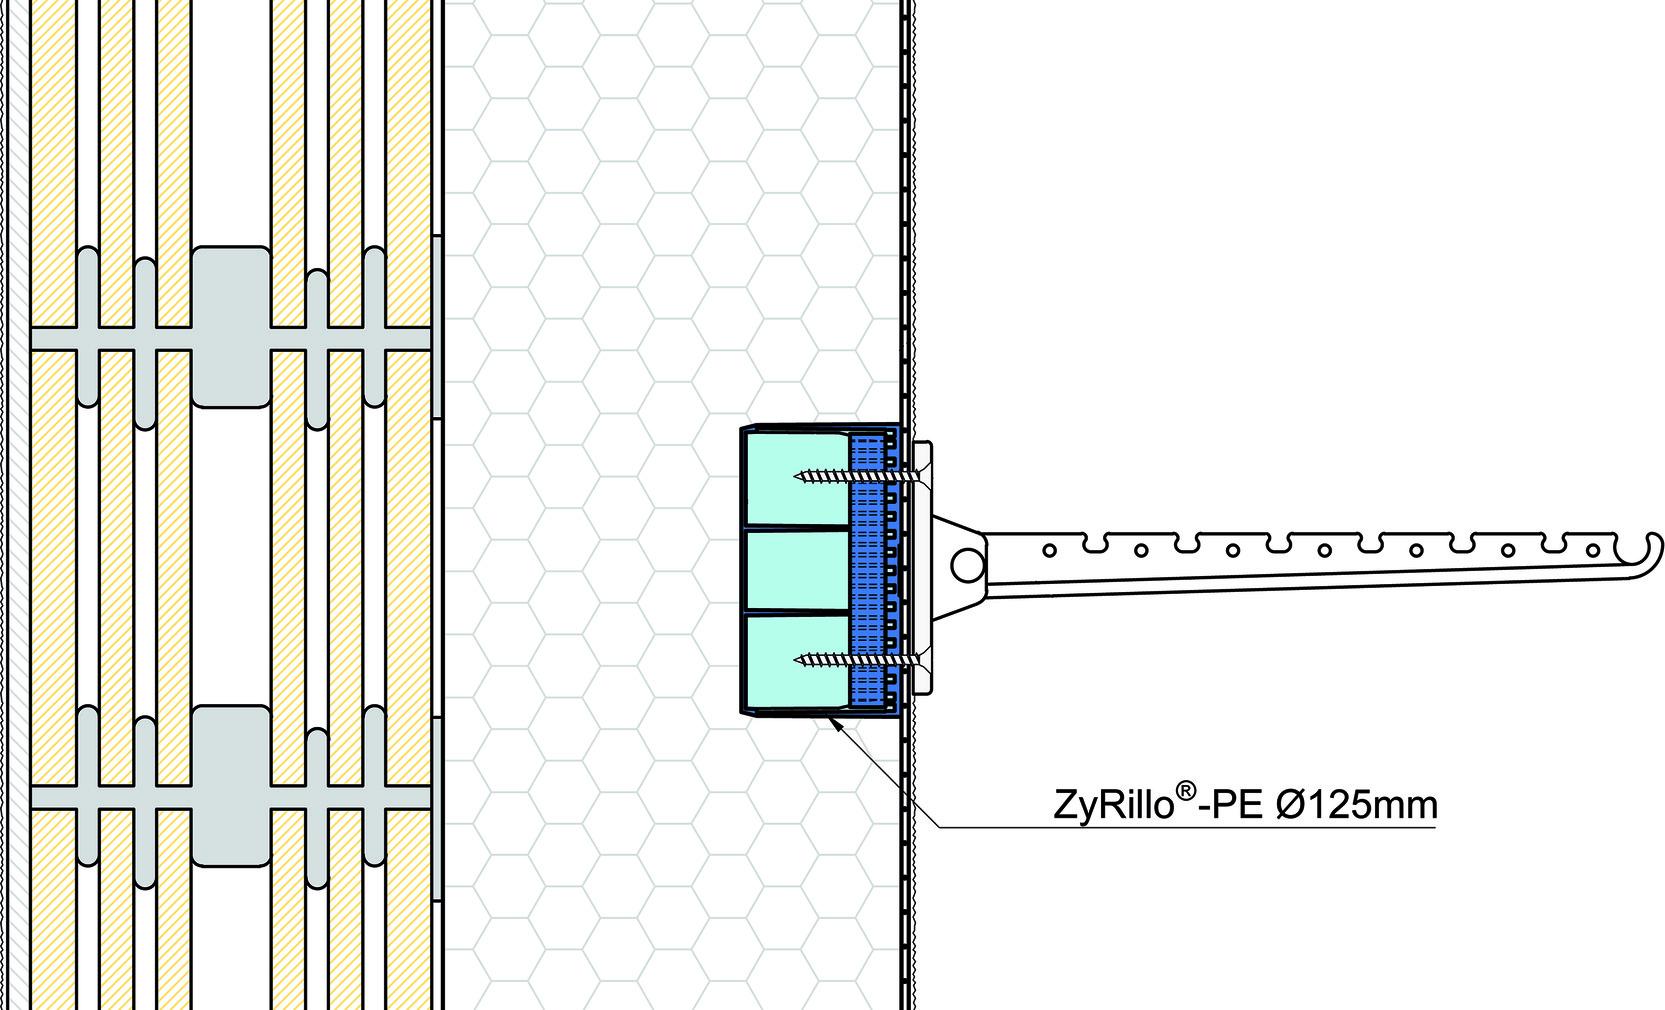 Cylindre de montage ZyRillo-PE